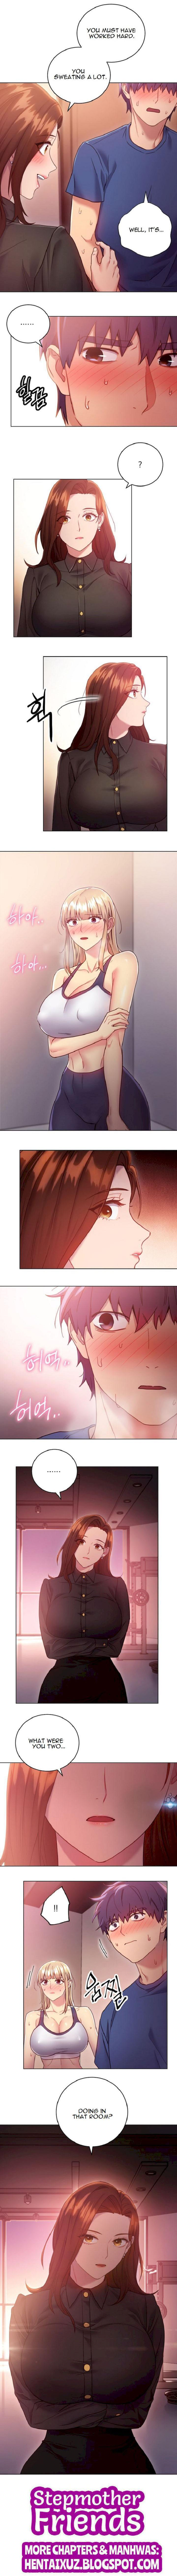 [Neck Pilllow] Stepmother Friends Ch.40/? [English] [Hentai Universe] NEW! 22/10/2020 176